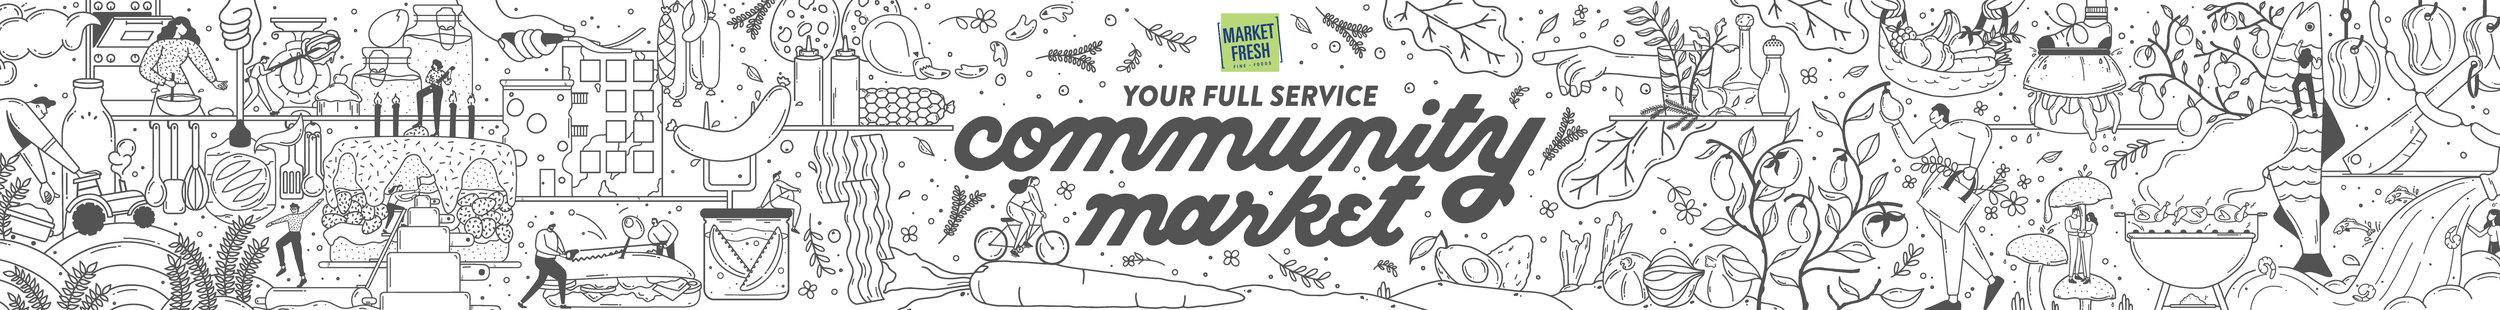 Market-Fresh_Printer_FINAL.jpg